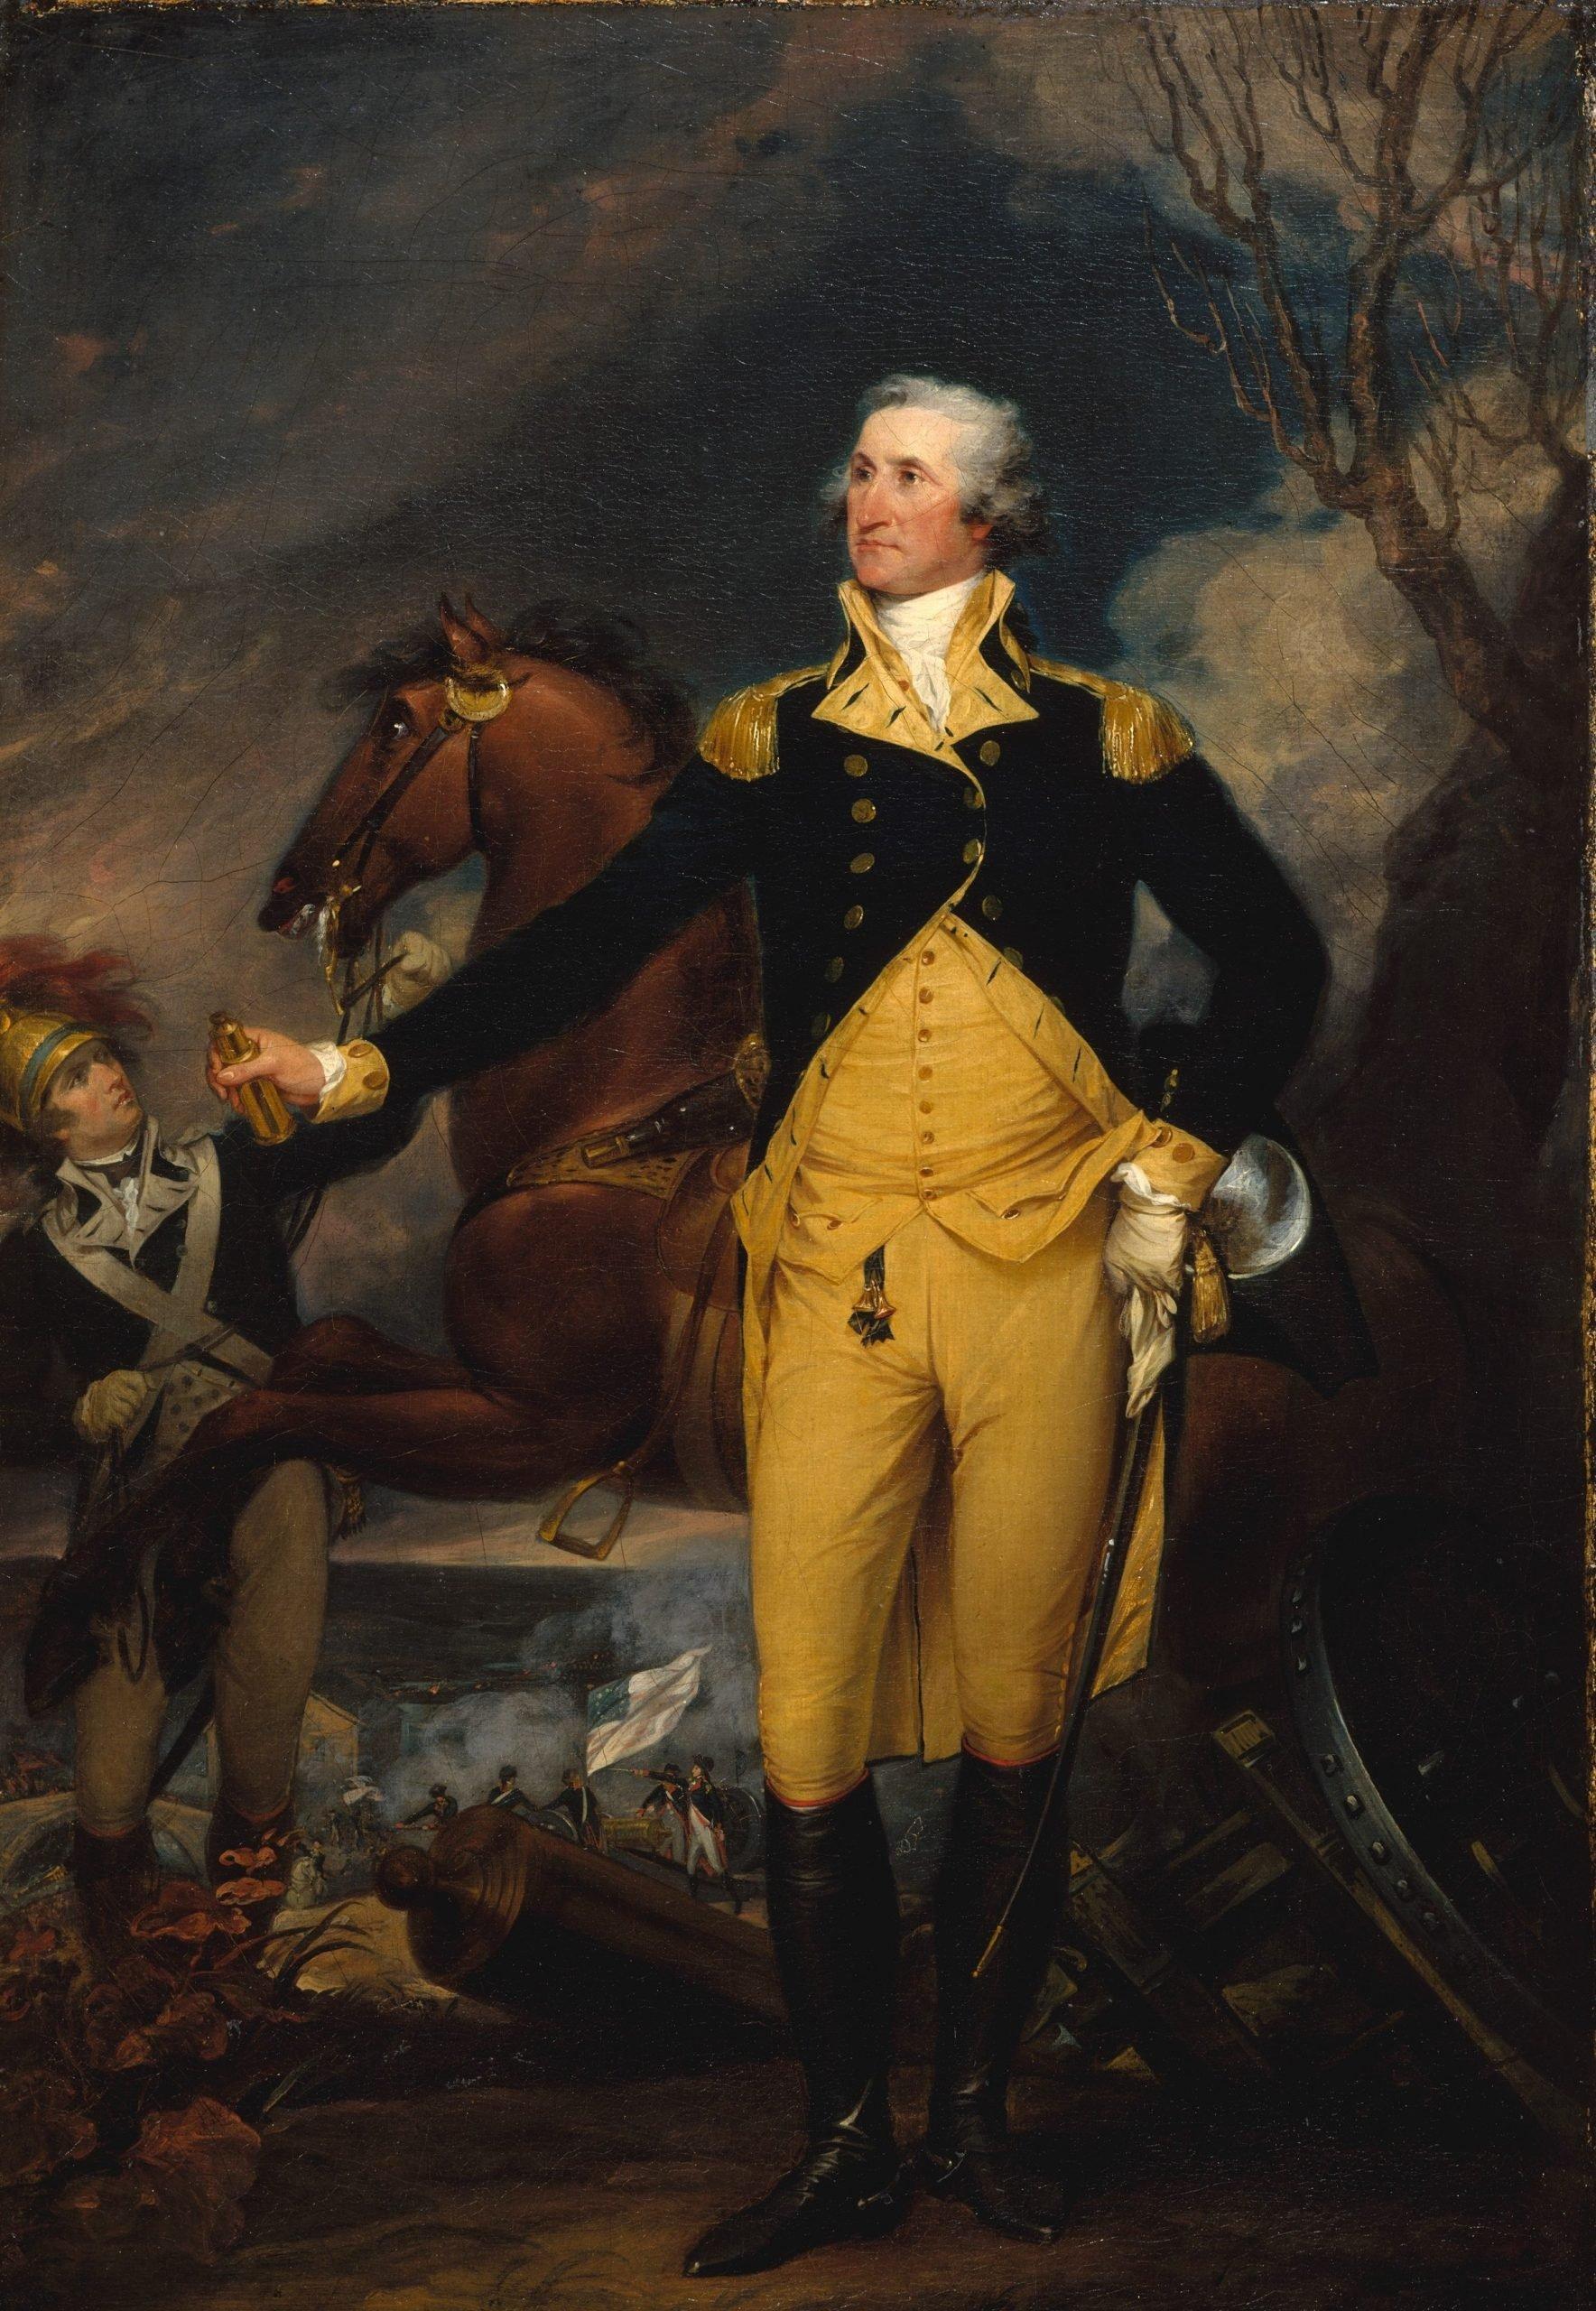 myths about george washington